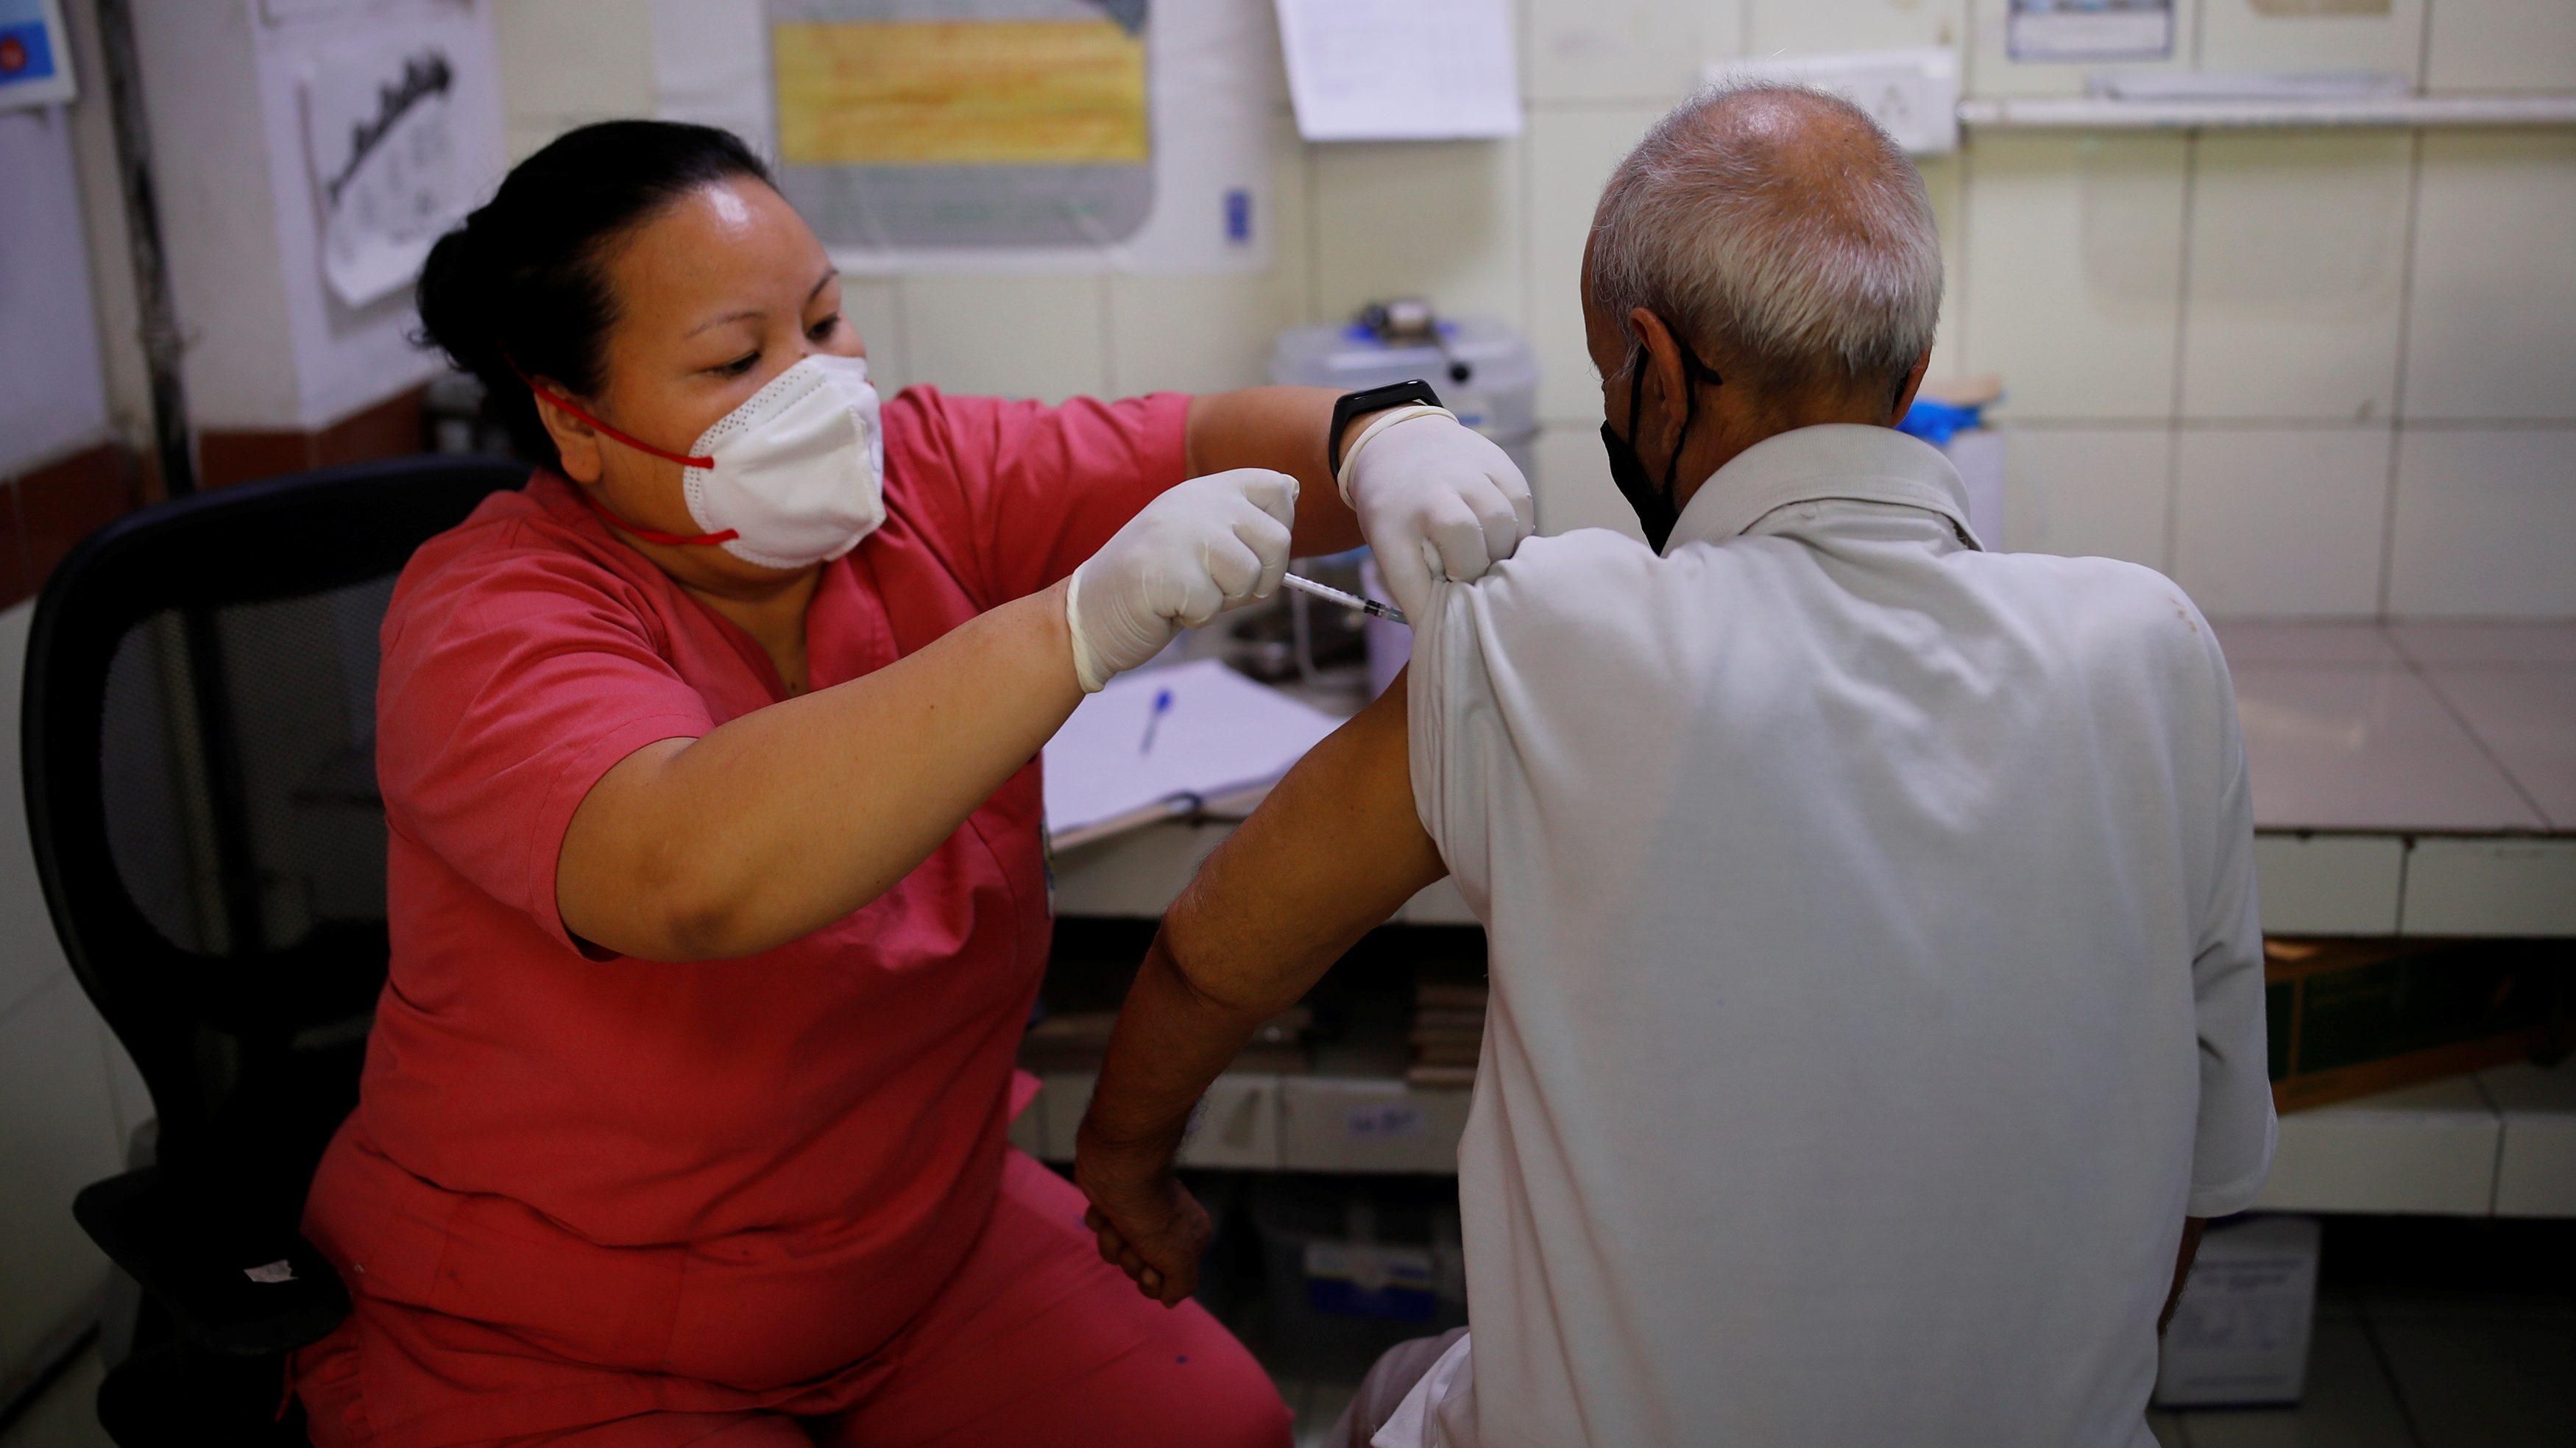 An elderly man received a dose of the Covishield Covid-9 vaccine in New Delhi, India.